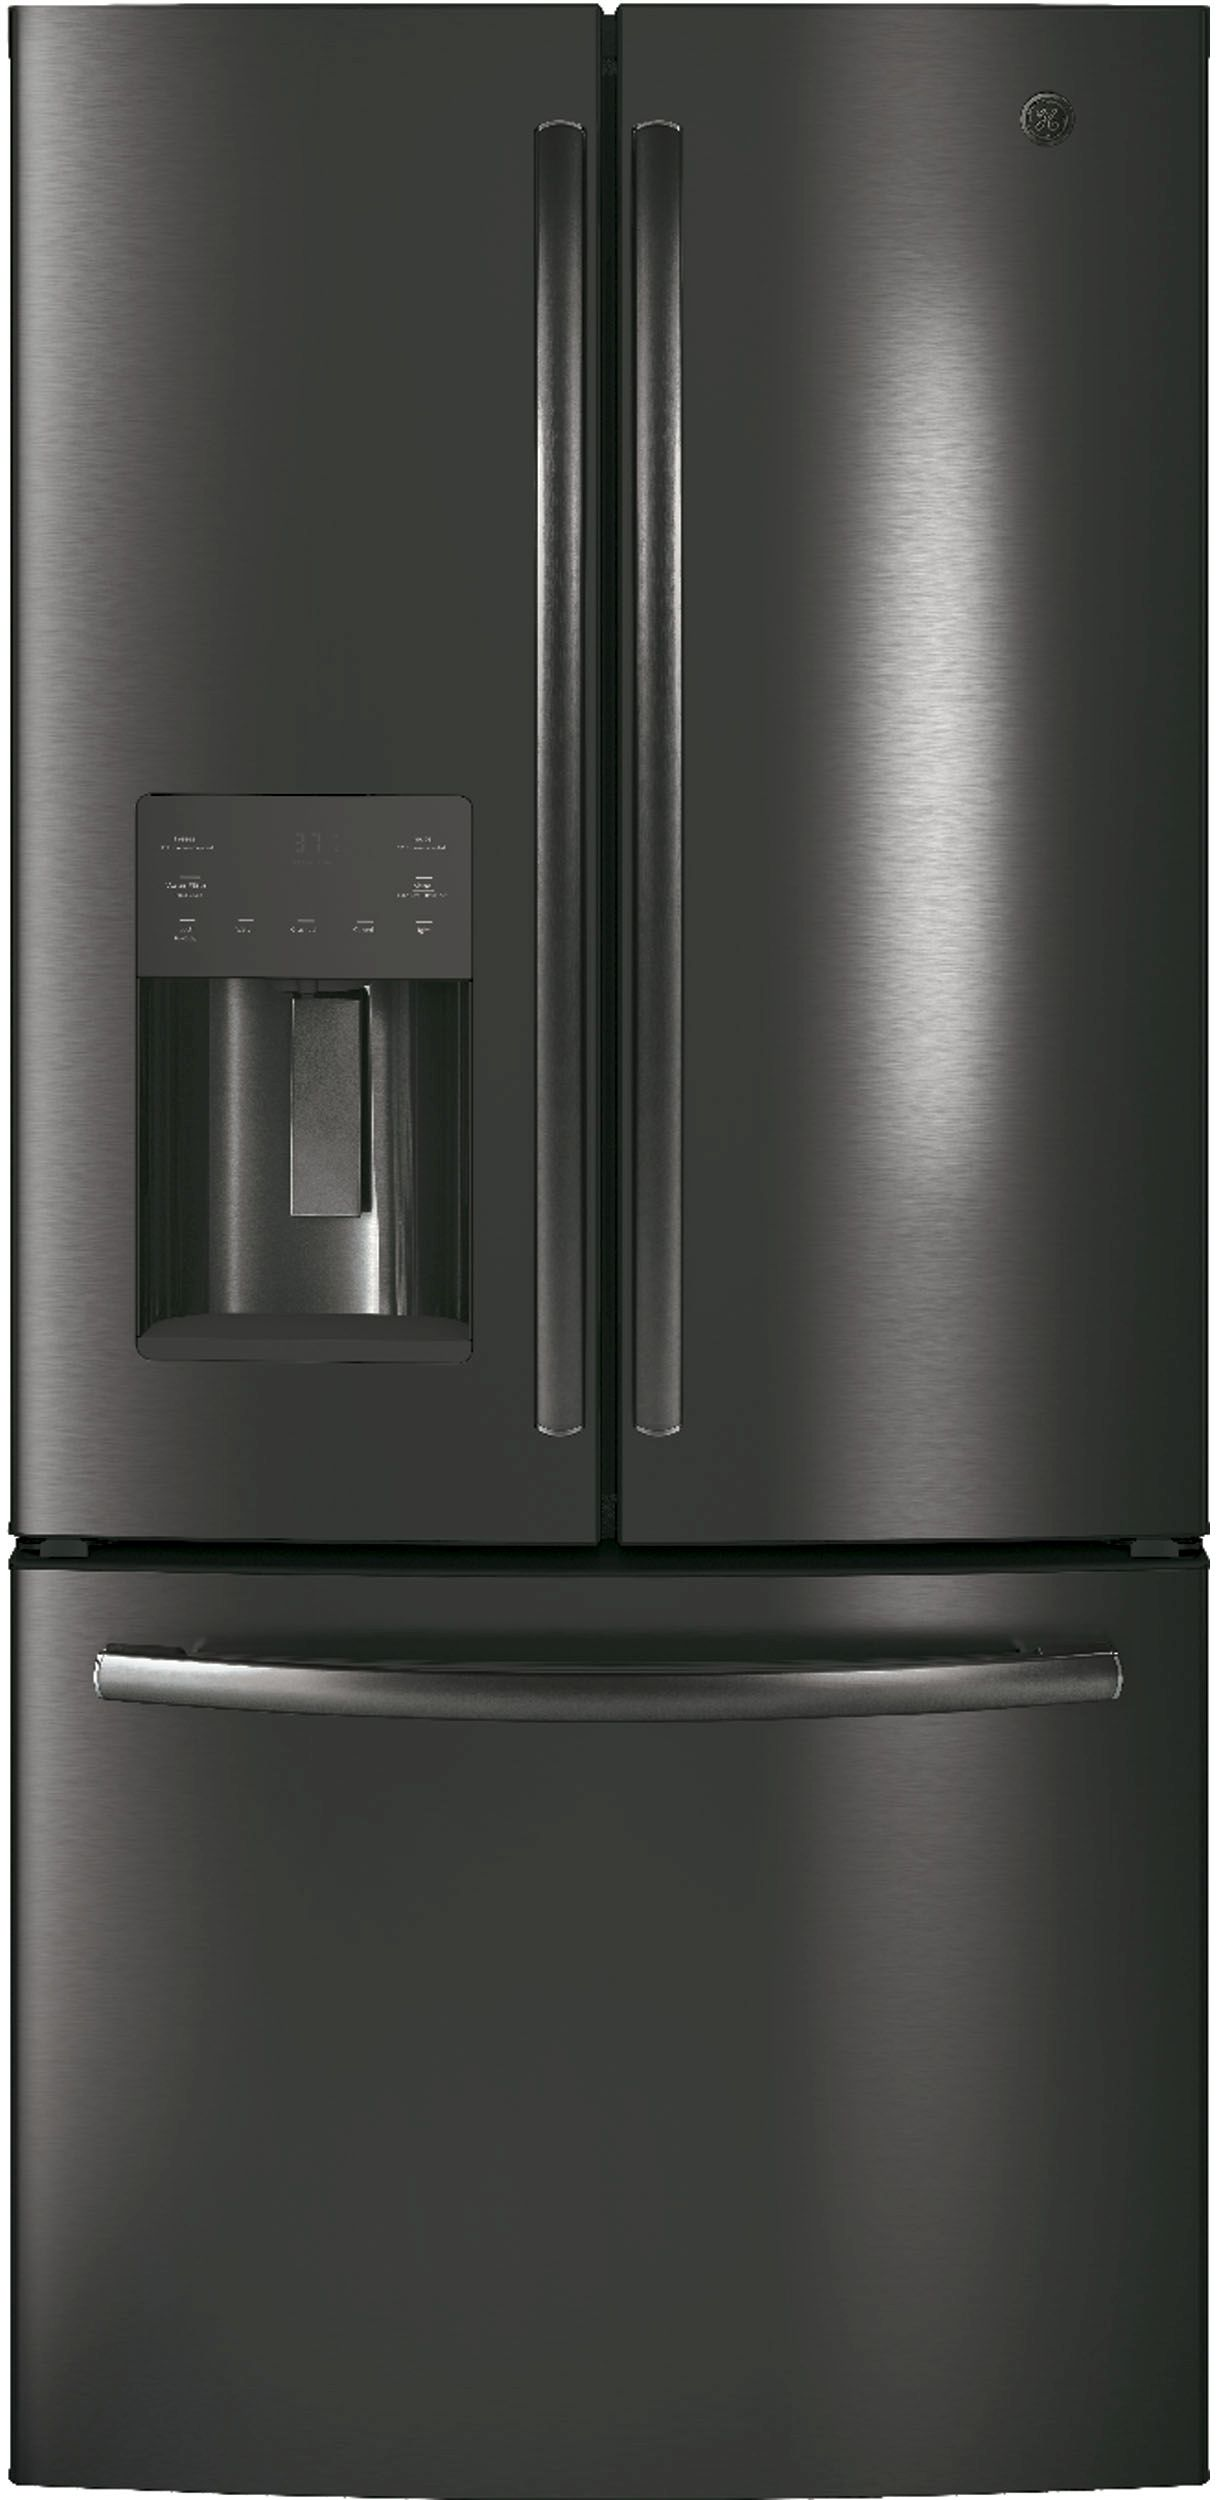 French door refrigerator ge 238 cu ft french door refrigerator black stainless steel gfe24jblts rubansaba